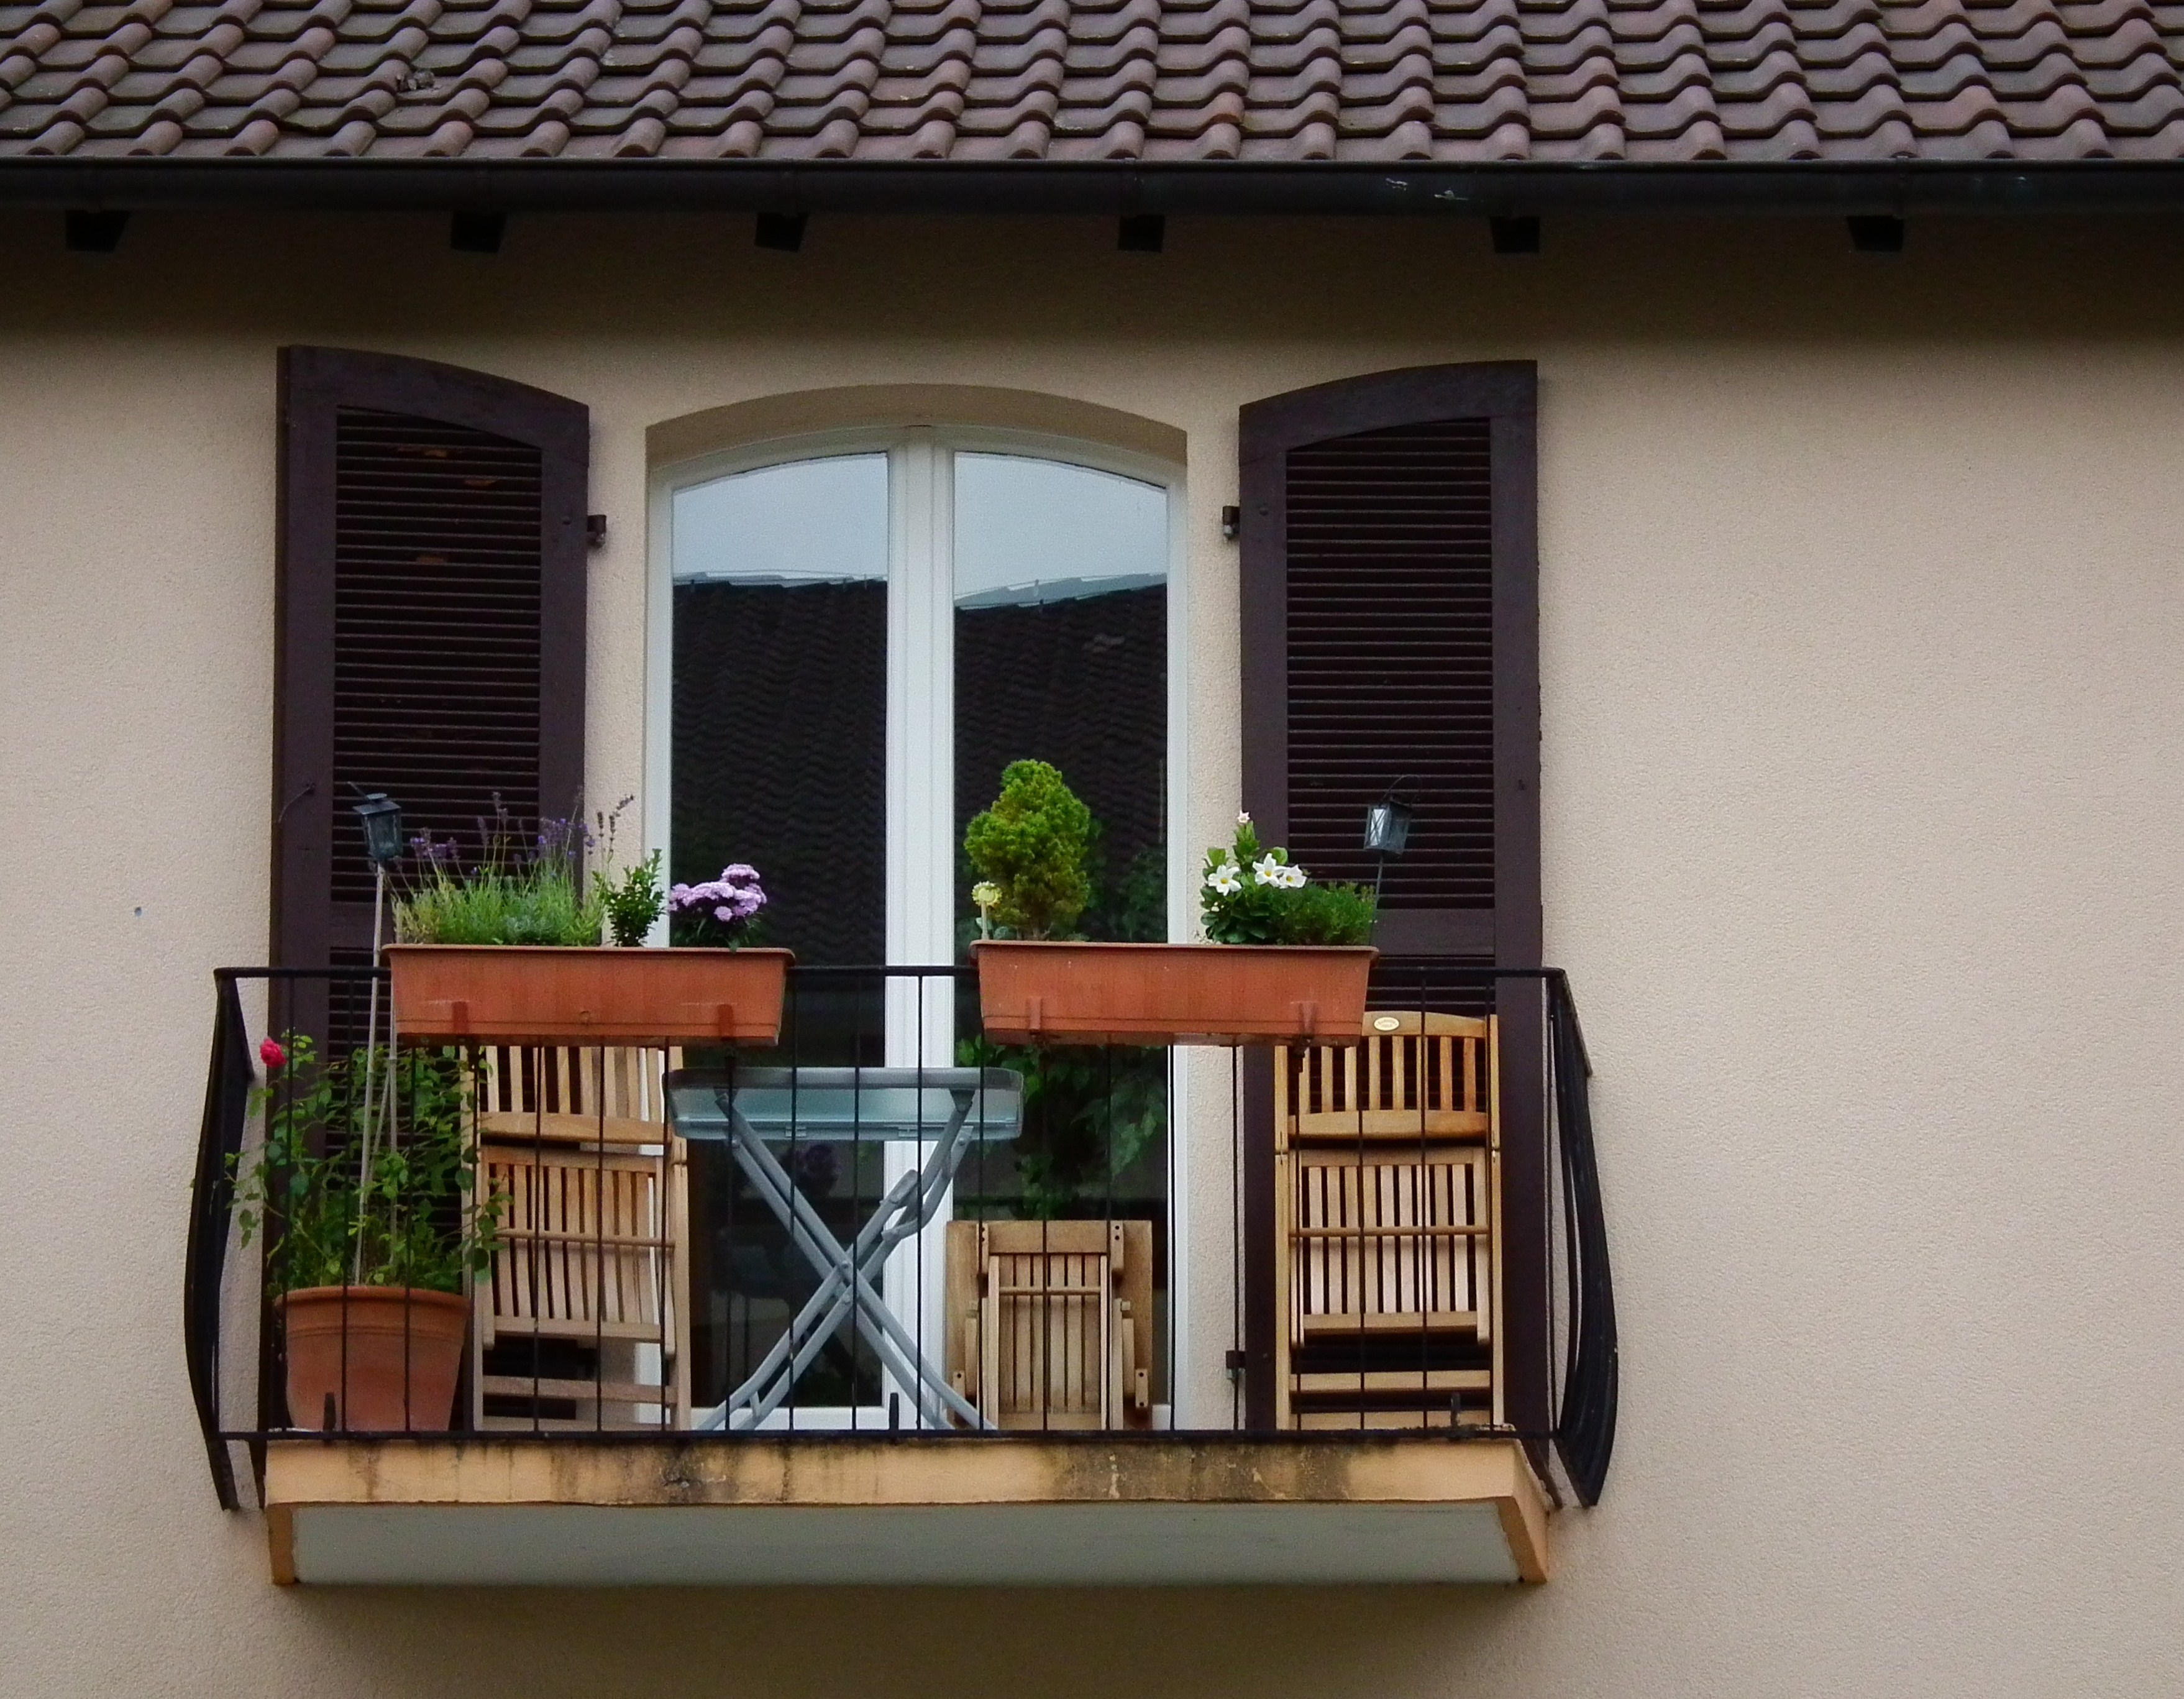 Deski Tarasowe Kompozytowe Stylowy Balkon Condor Biznes